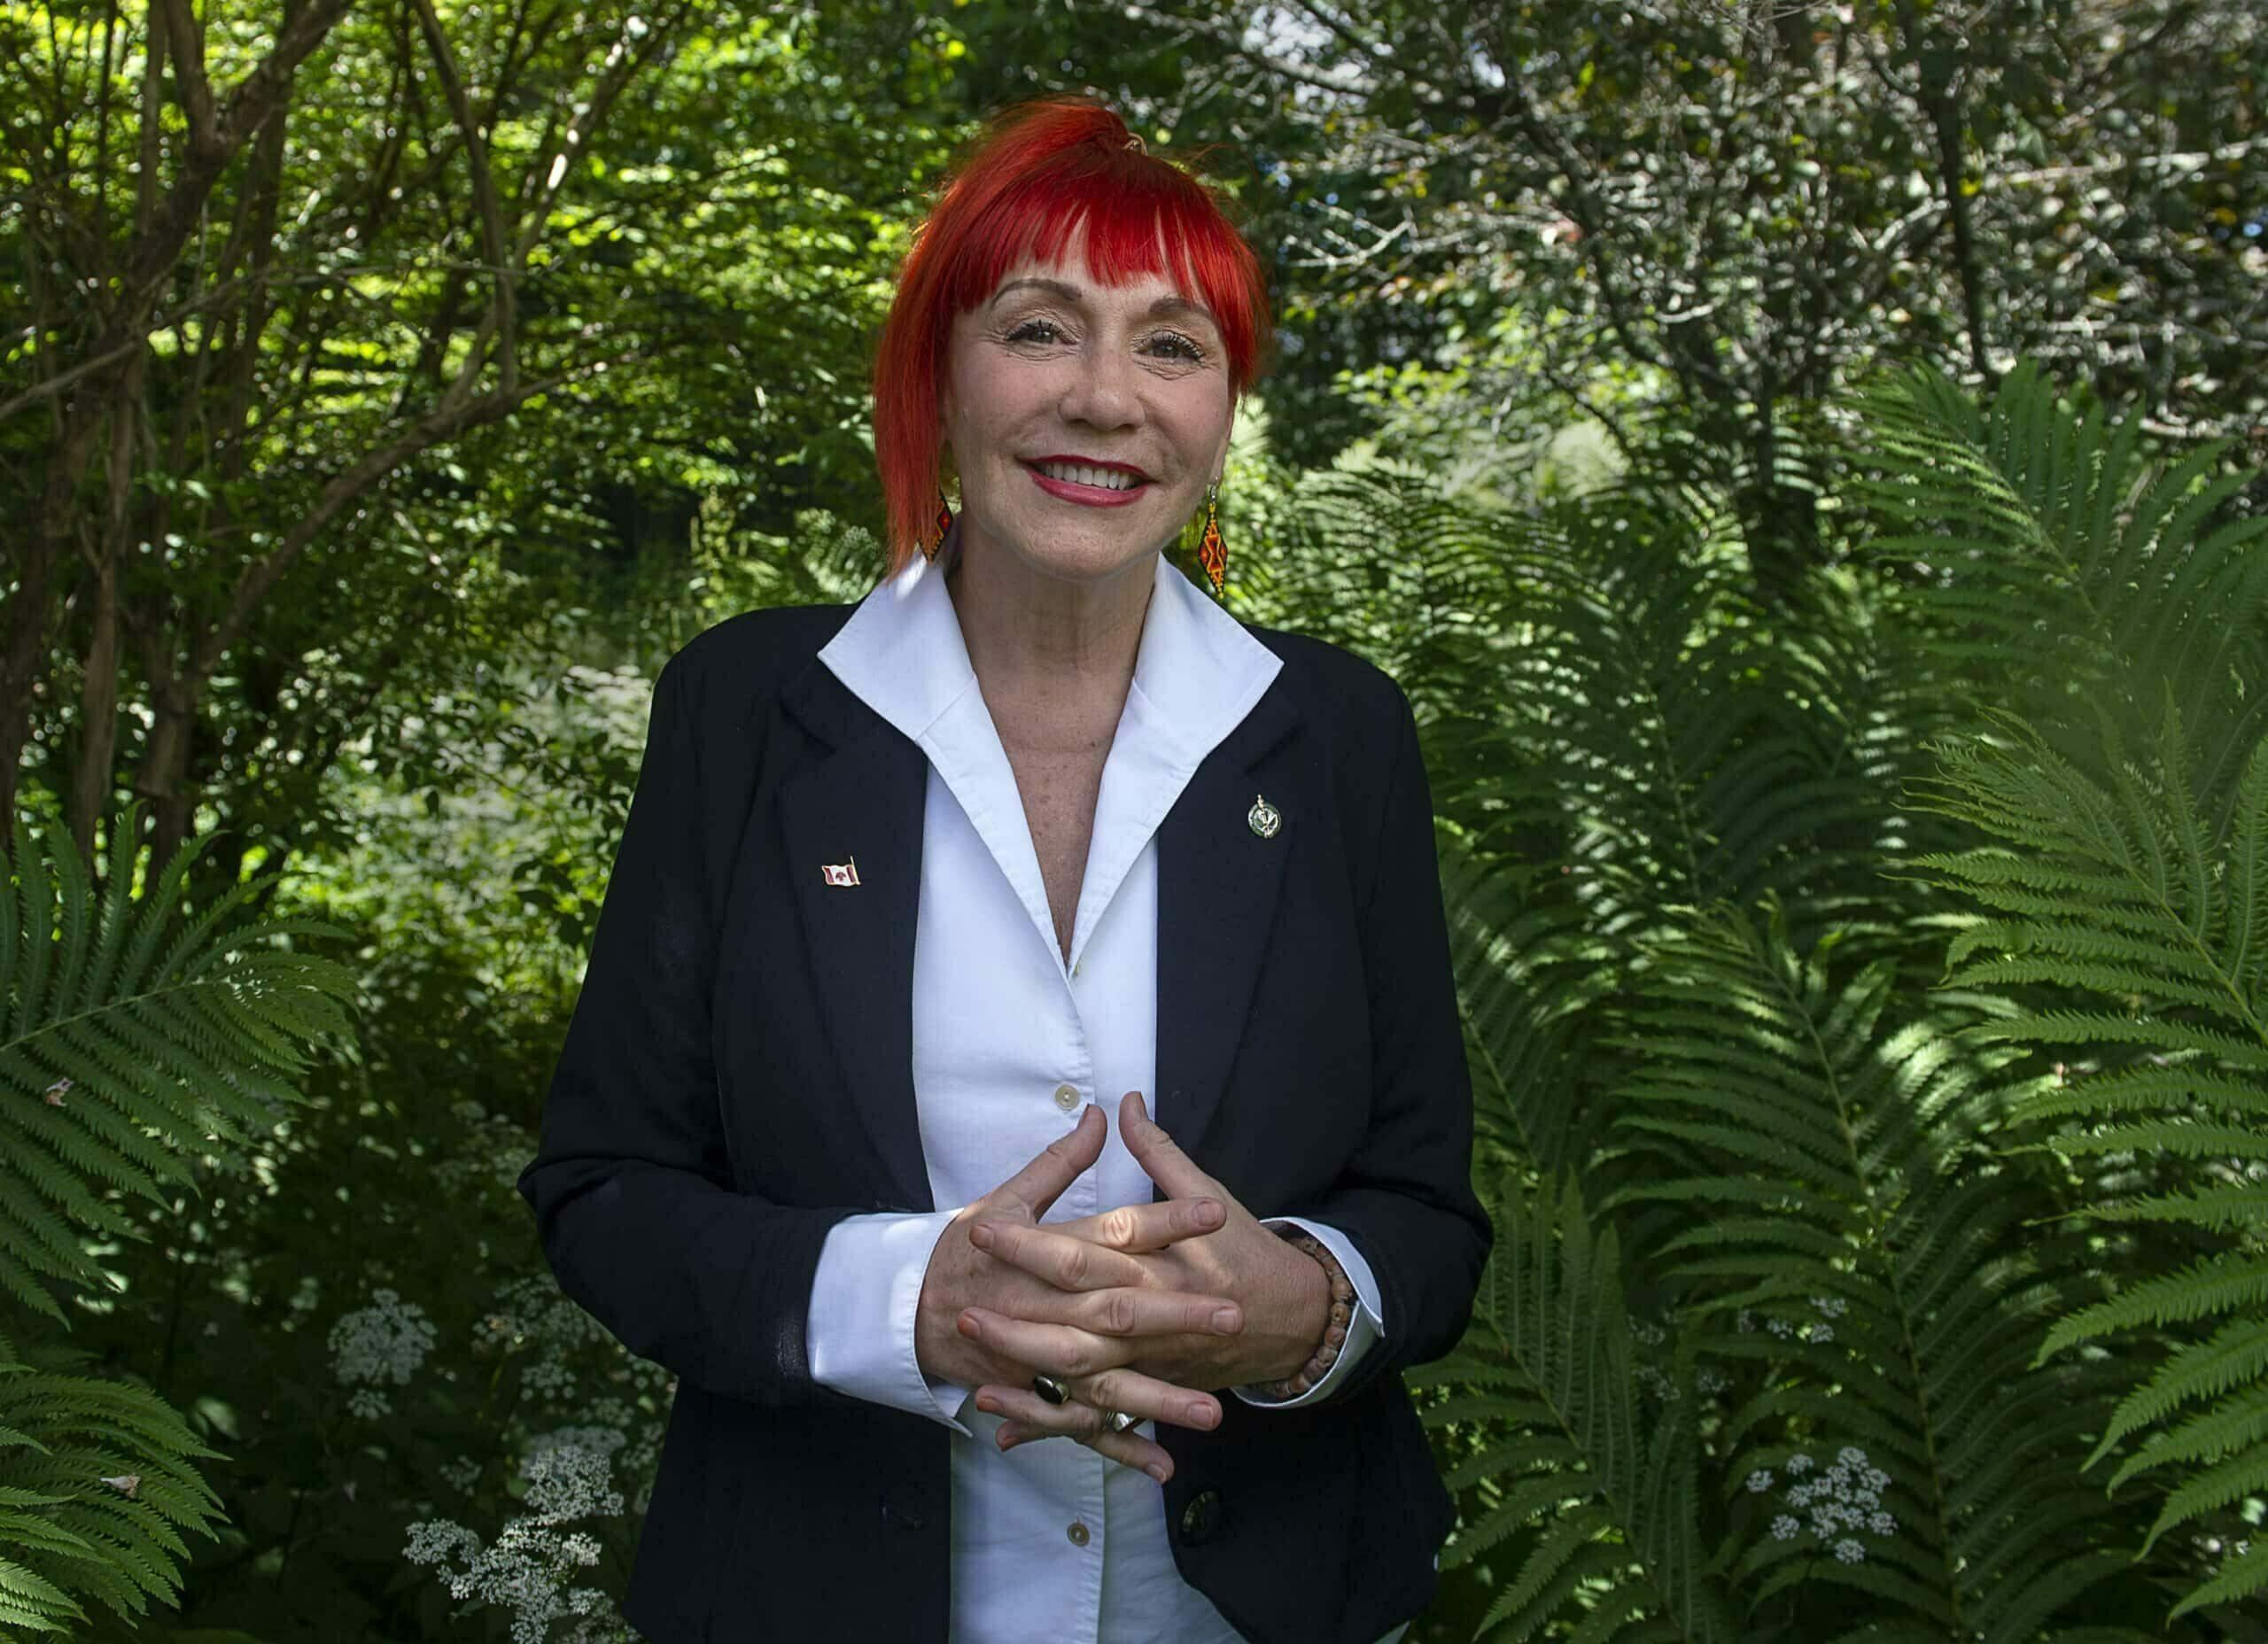 Nova Scotia MP Lenore Zann